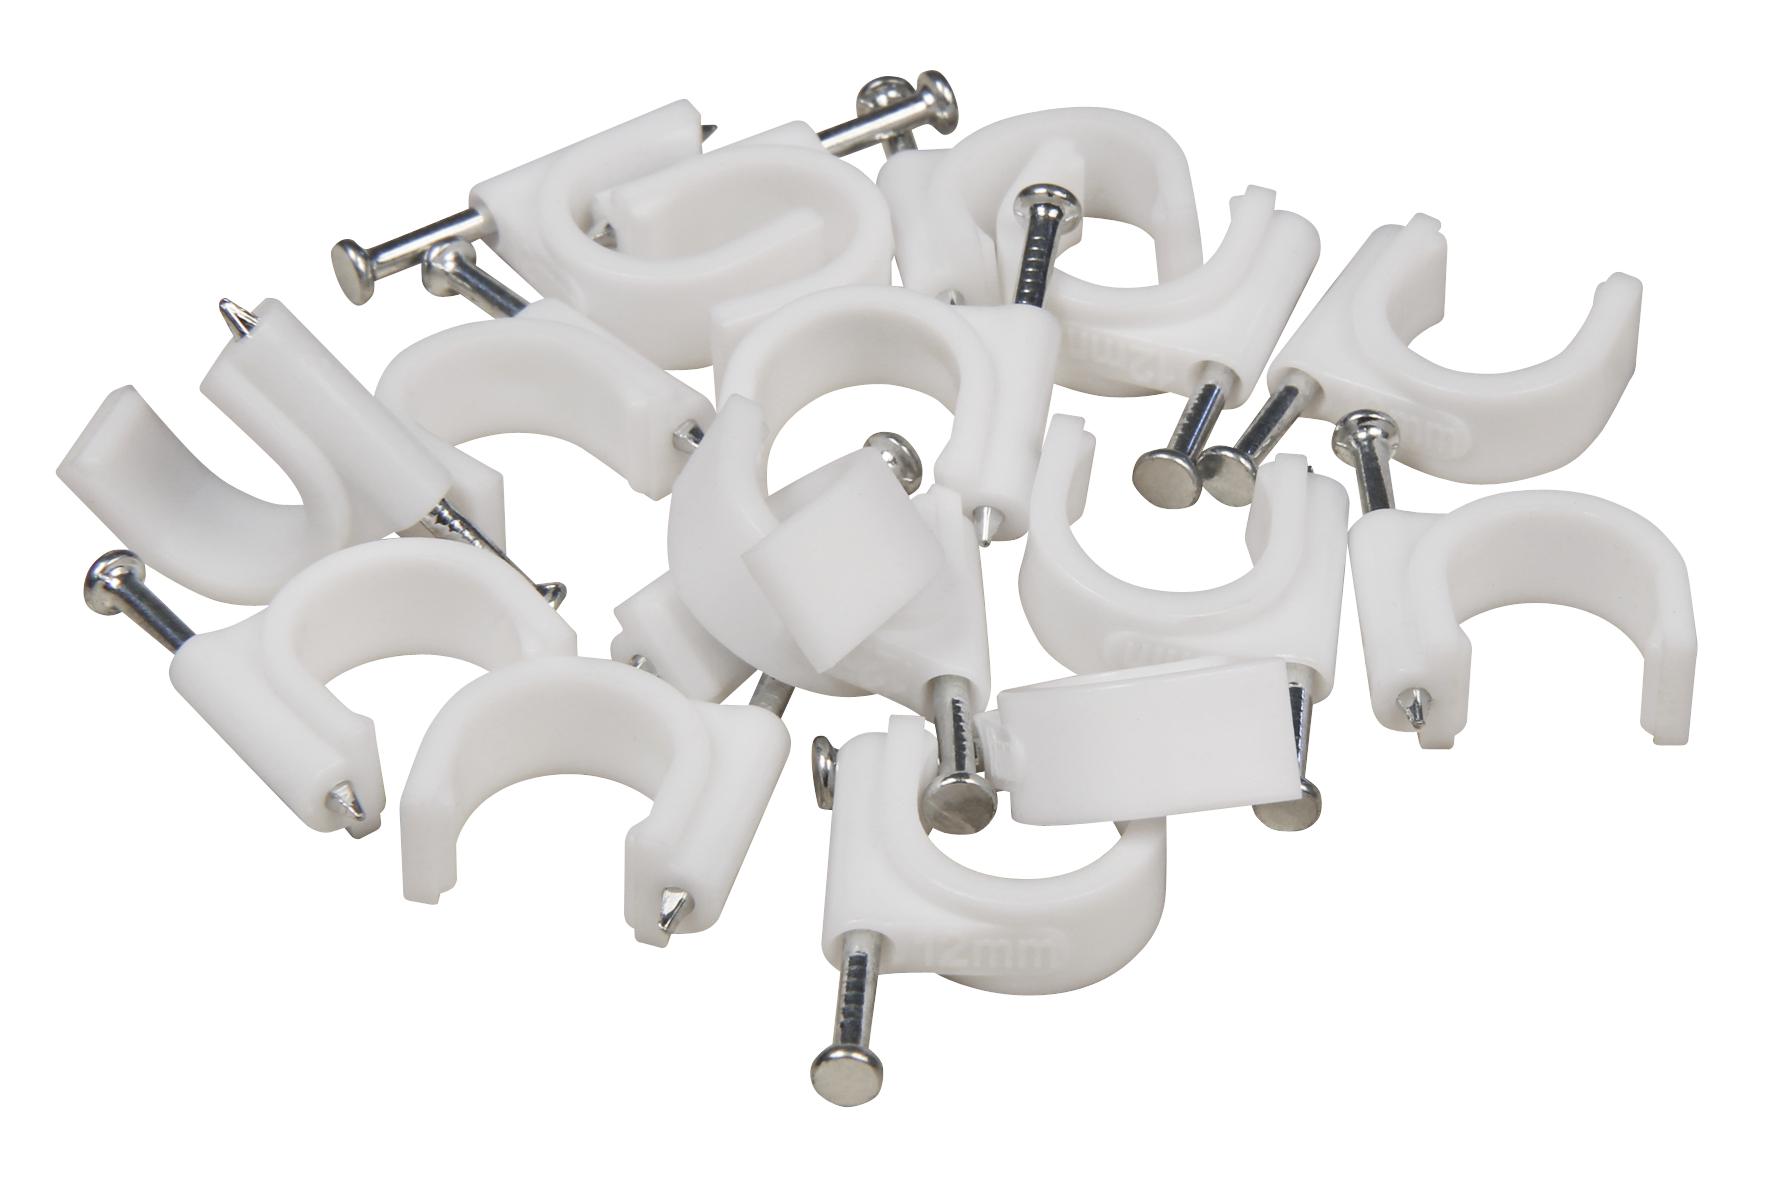 Kabelschelle McPower, 12mm, 100er-Pack, weiß